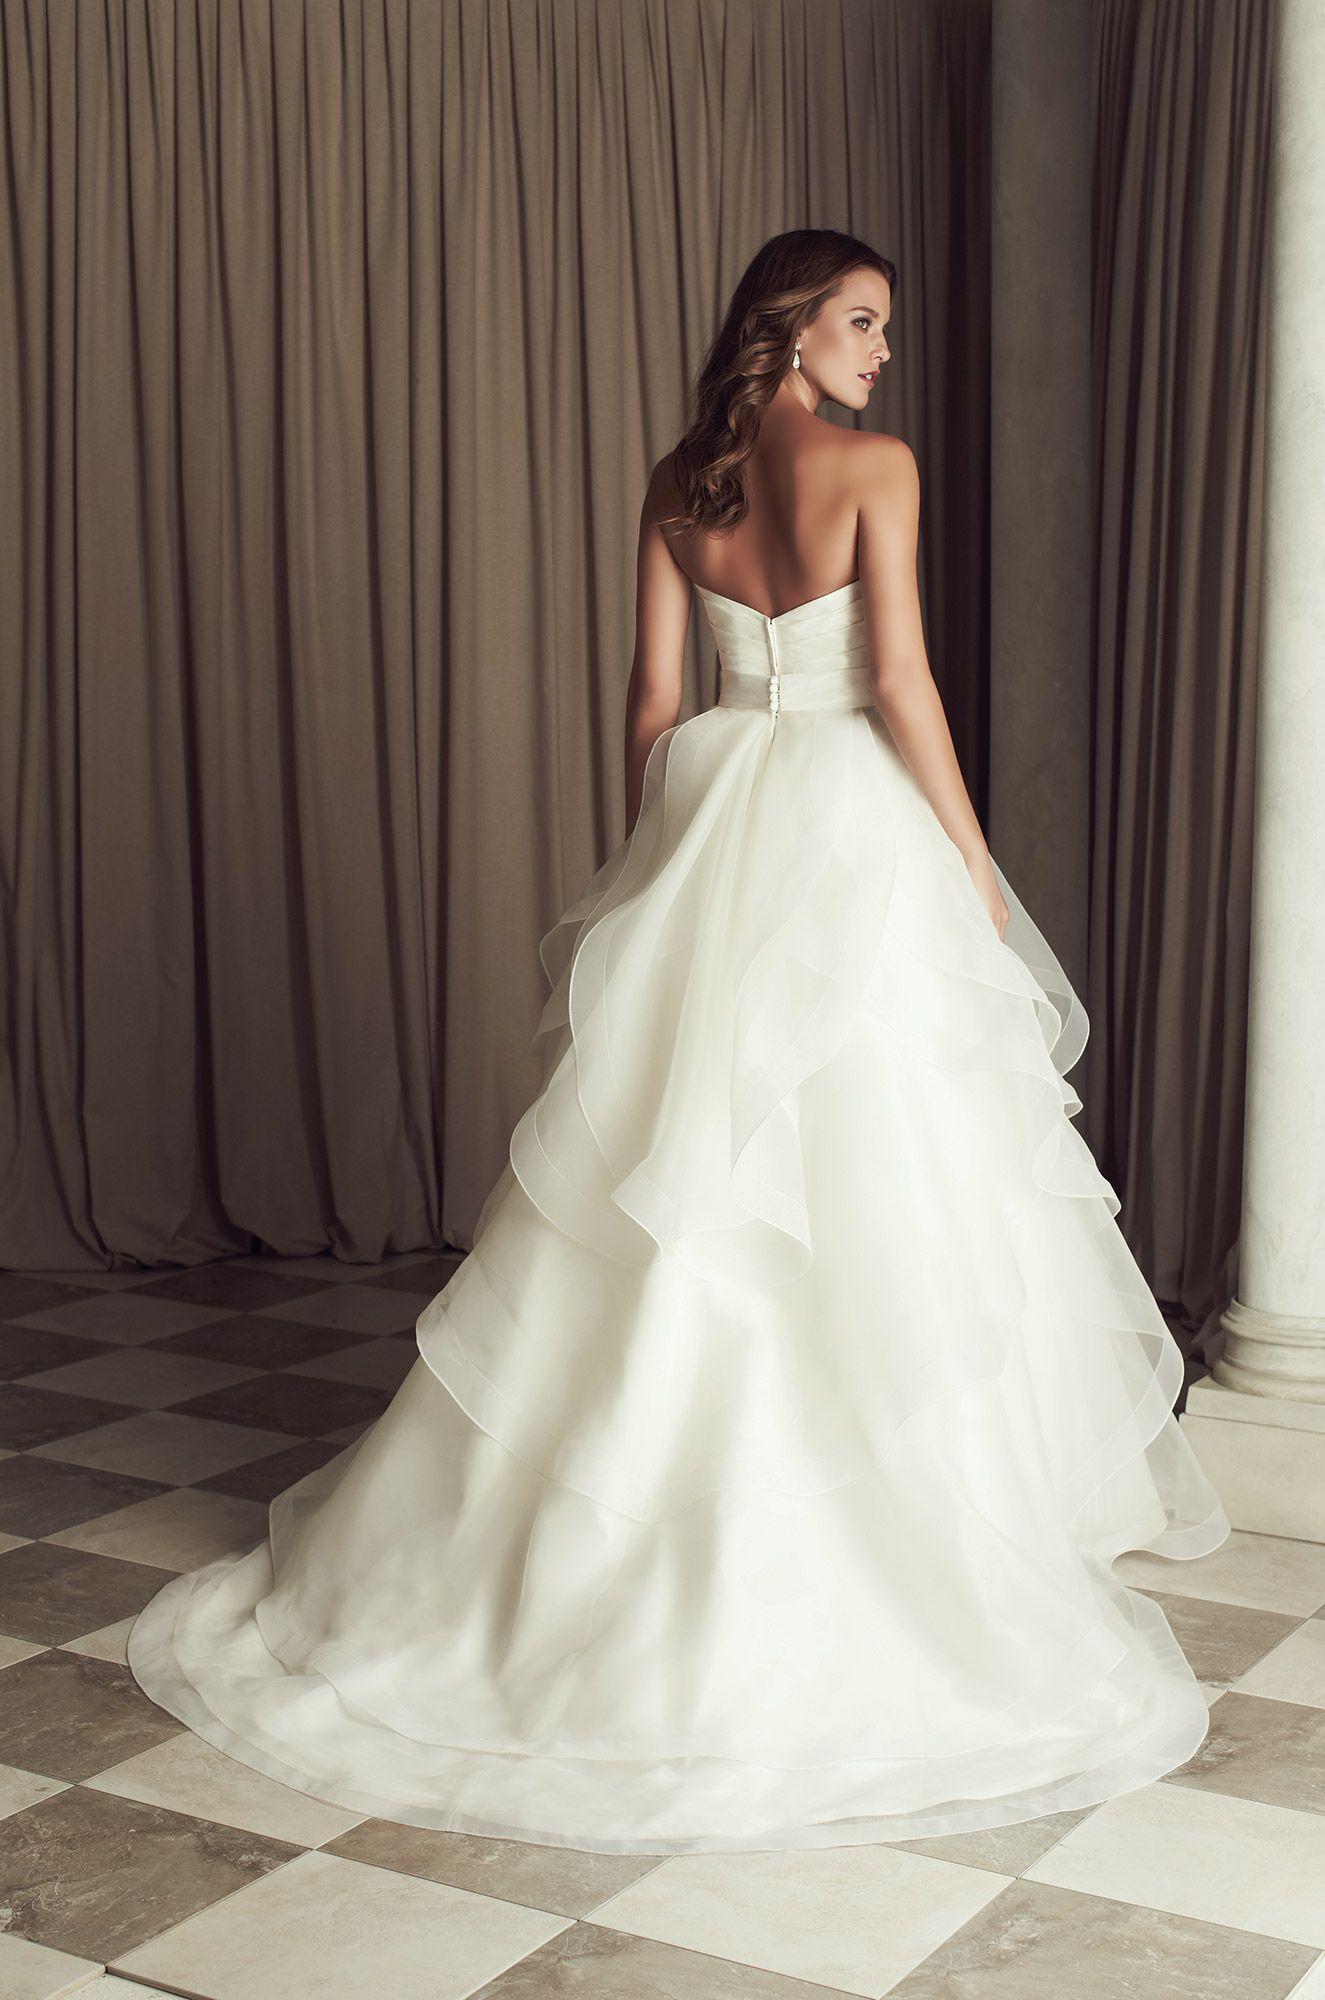 Corset Under Wedding Dress Womens Dresses For Weddings Check More